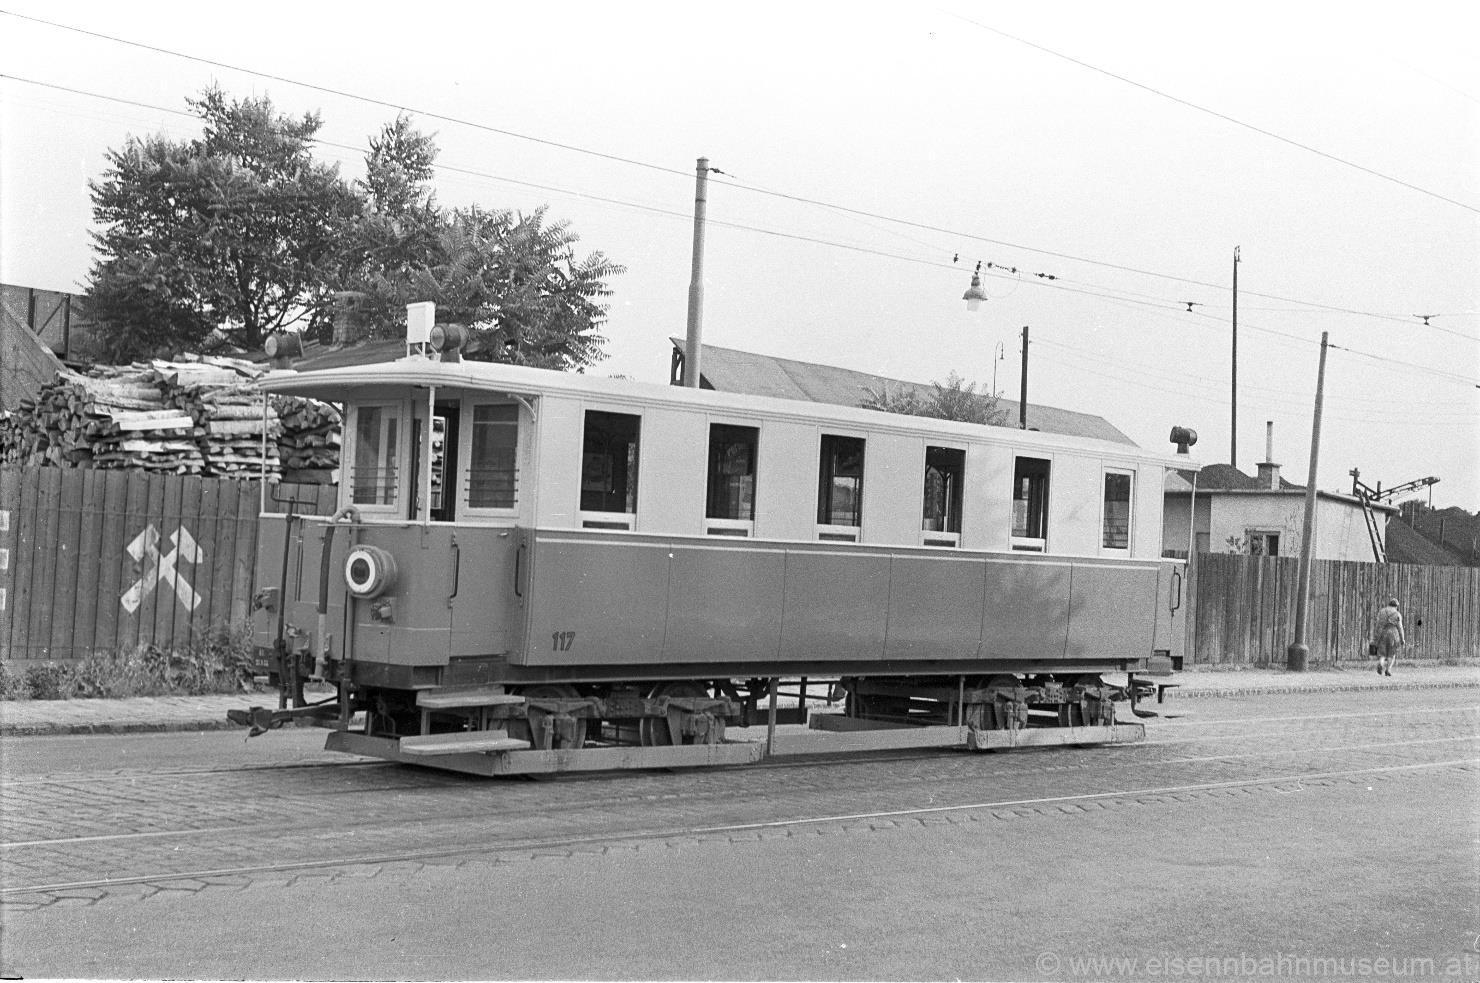 Personenwagen WLB 117